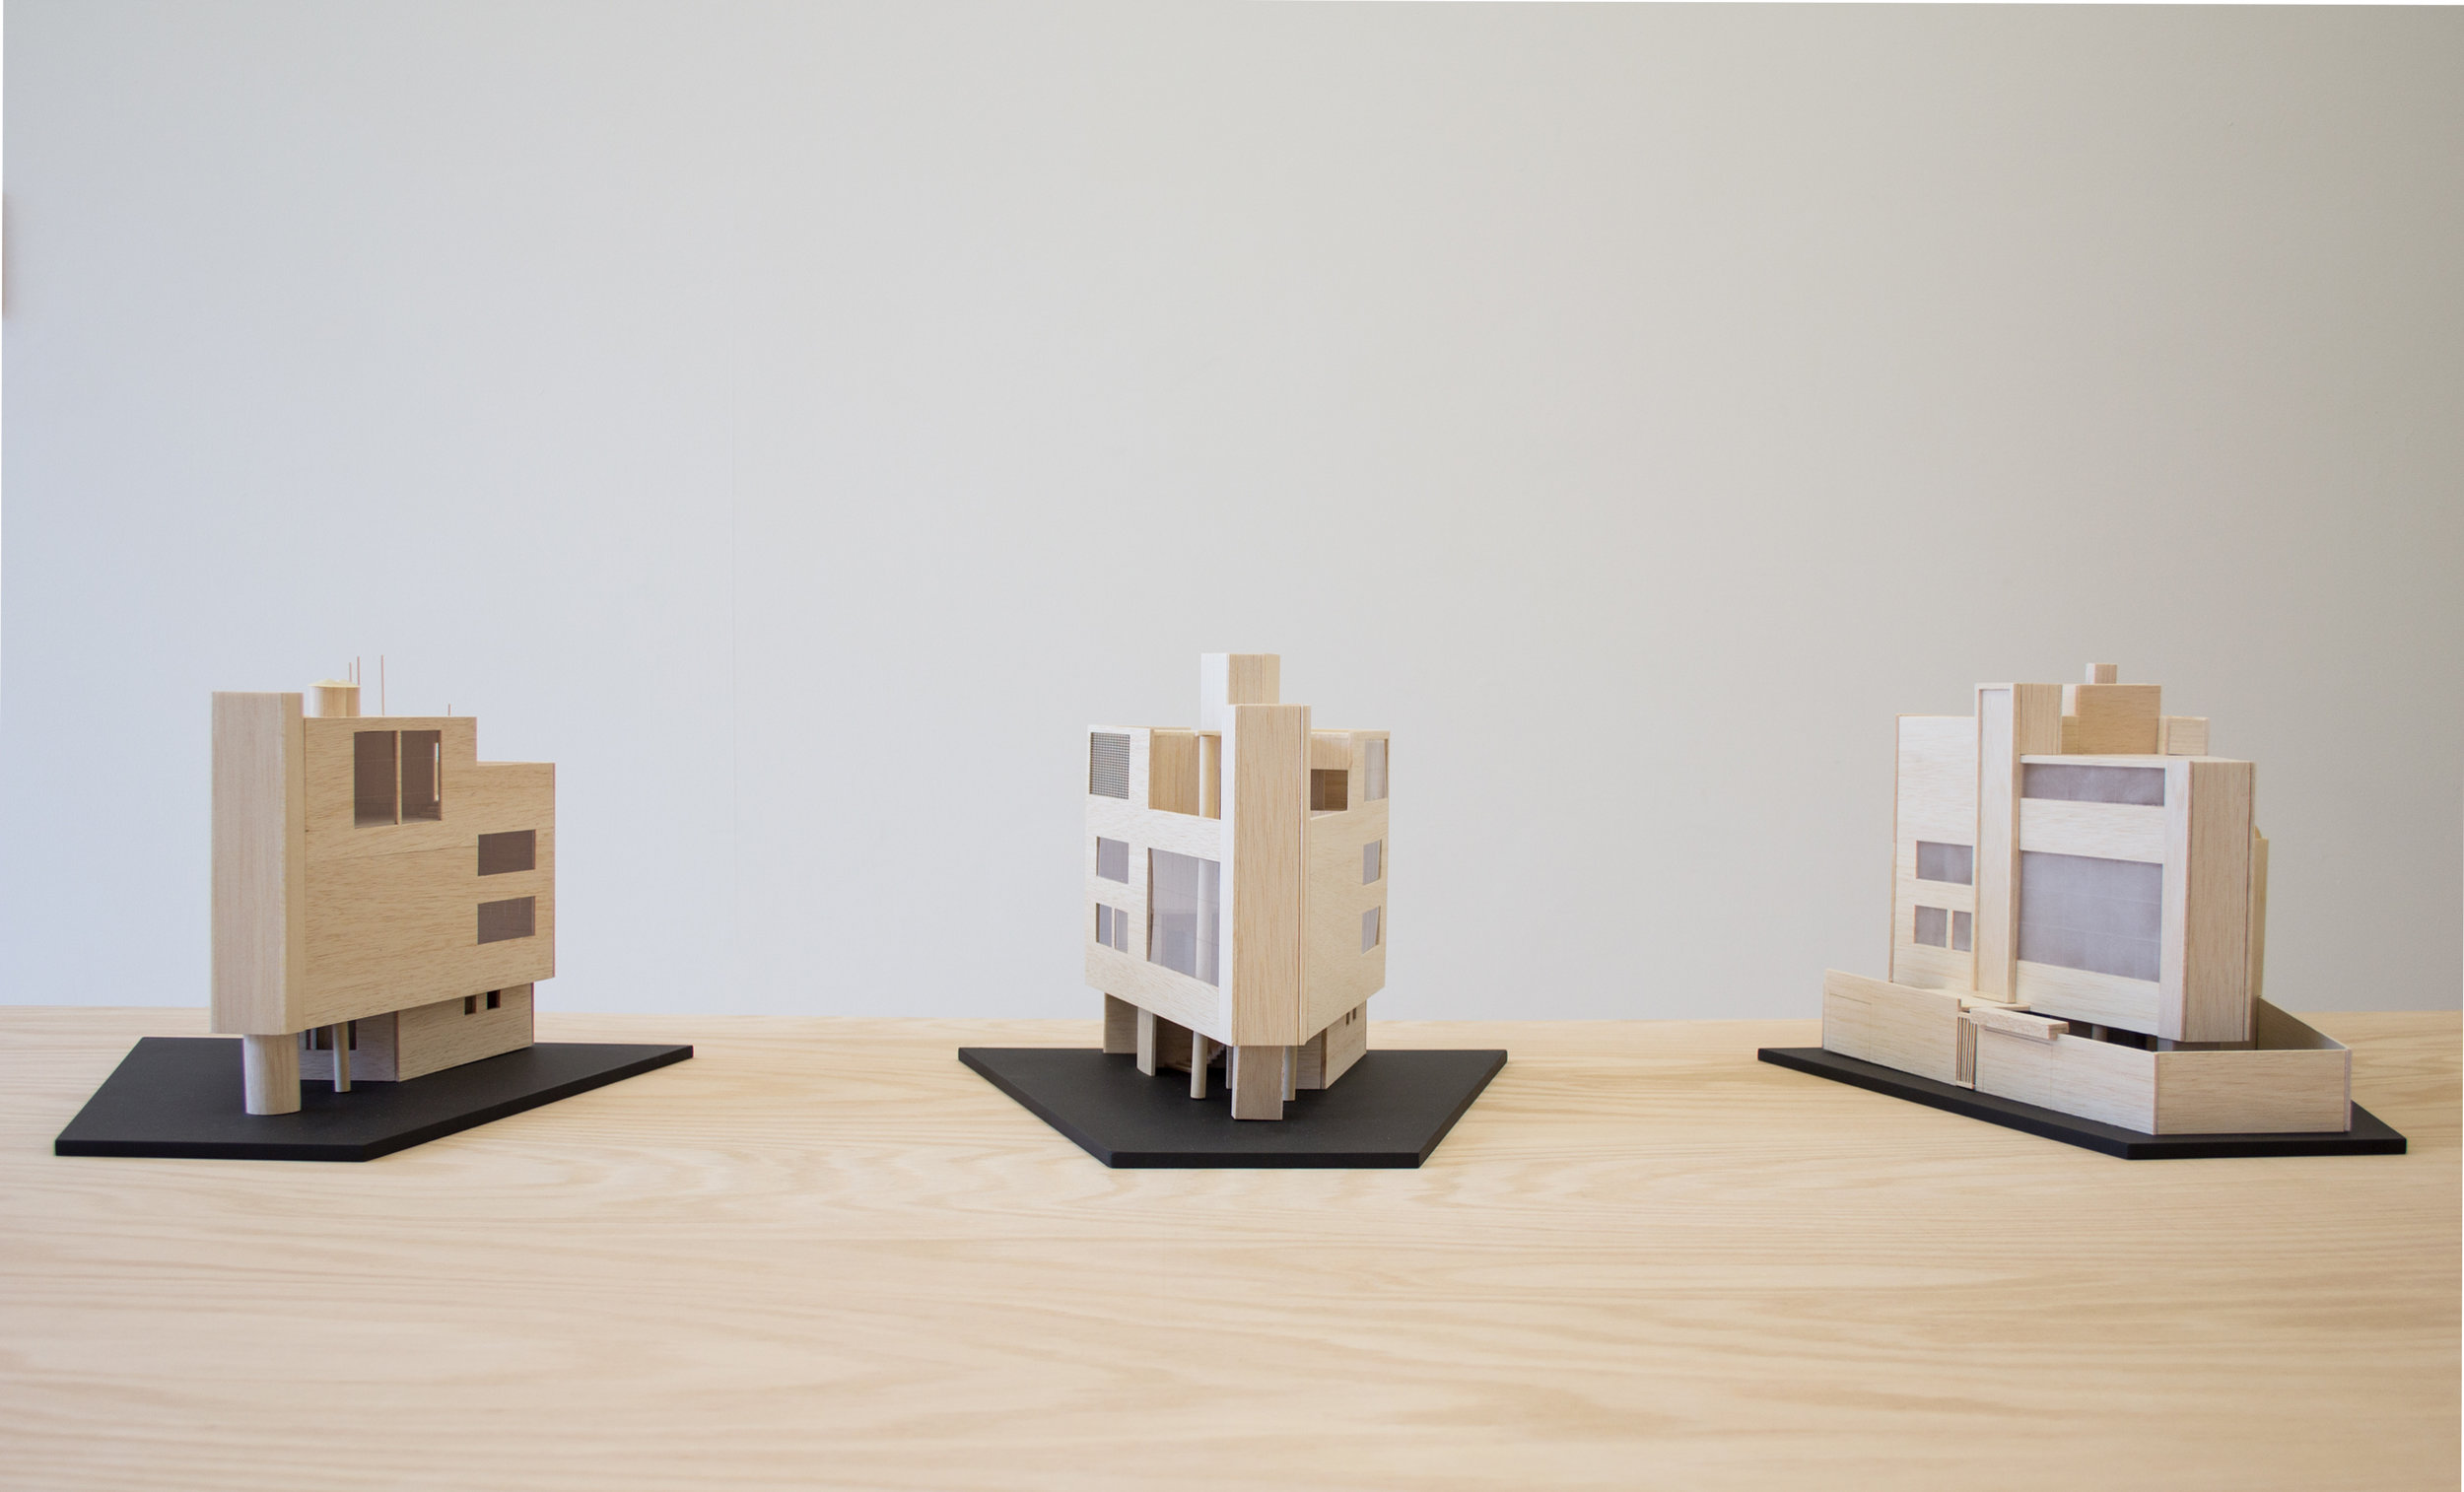 Degradation , 2017, Wood, acrylic paint, plexiglass, dimensions variable